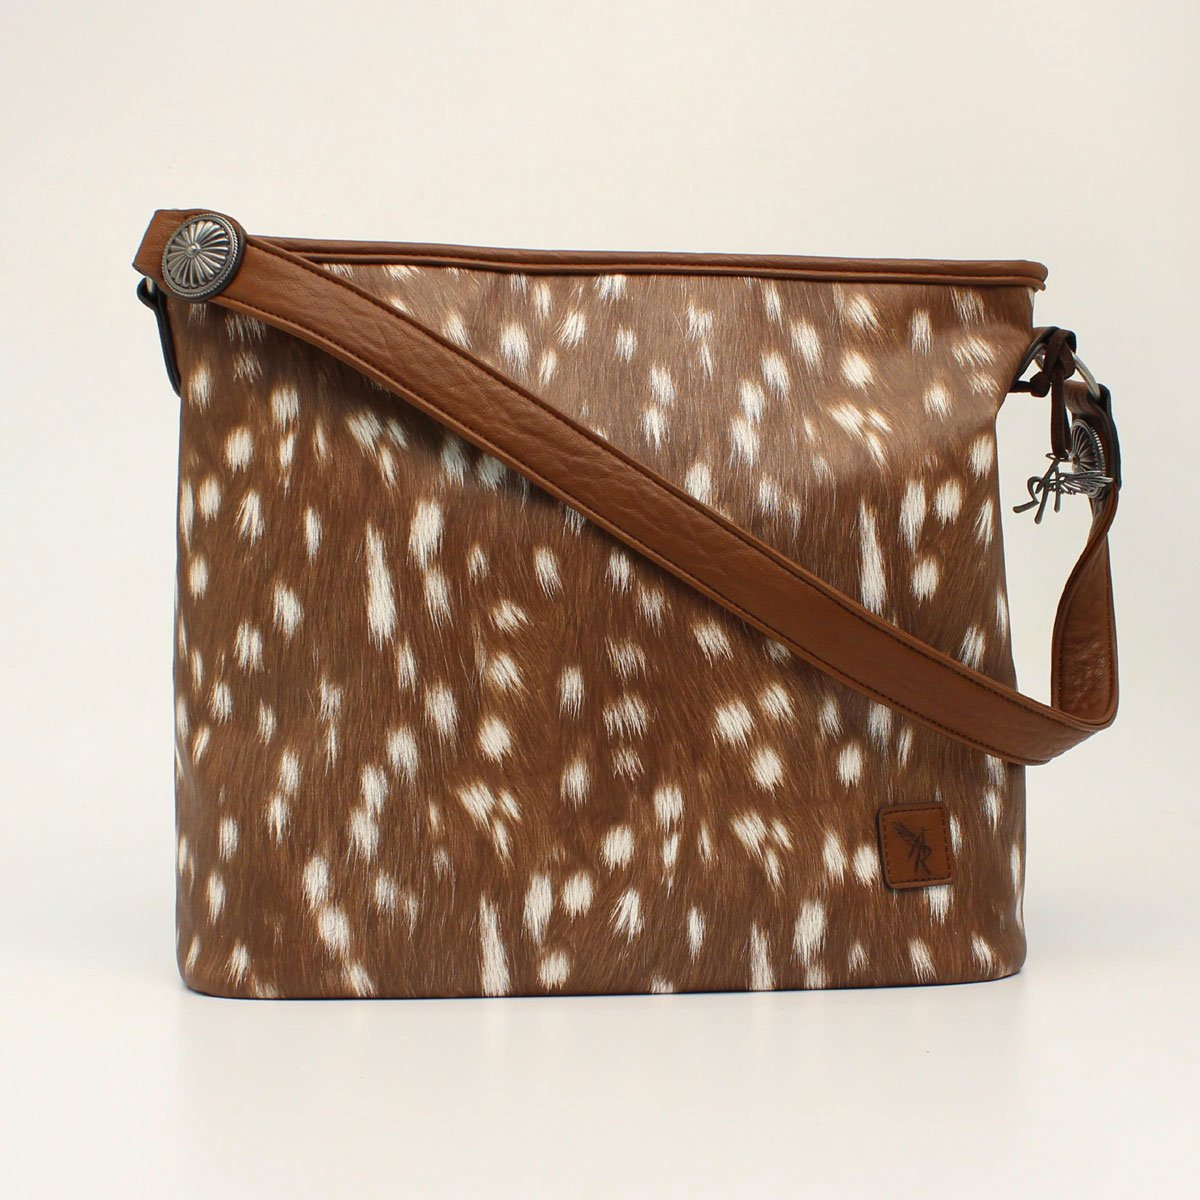 Angel Ranch Deer Print Conceal & Carry Handbag